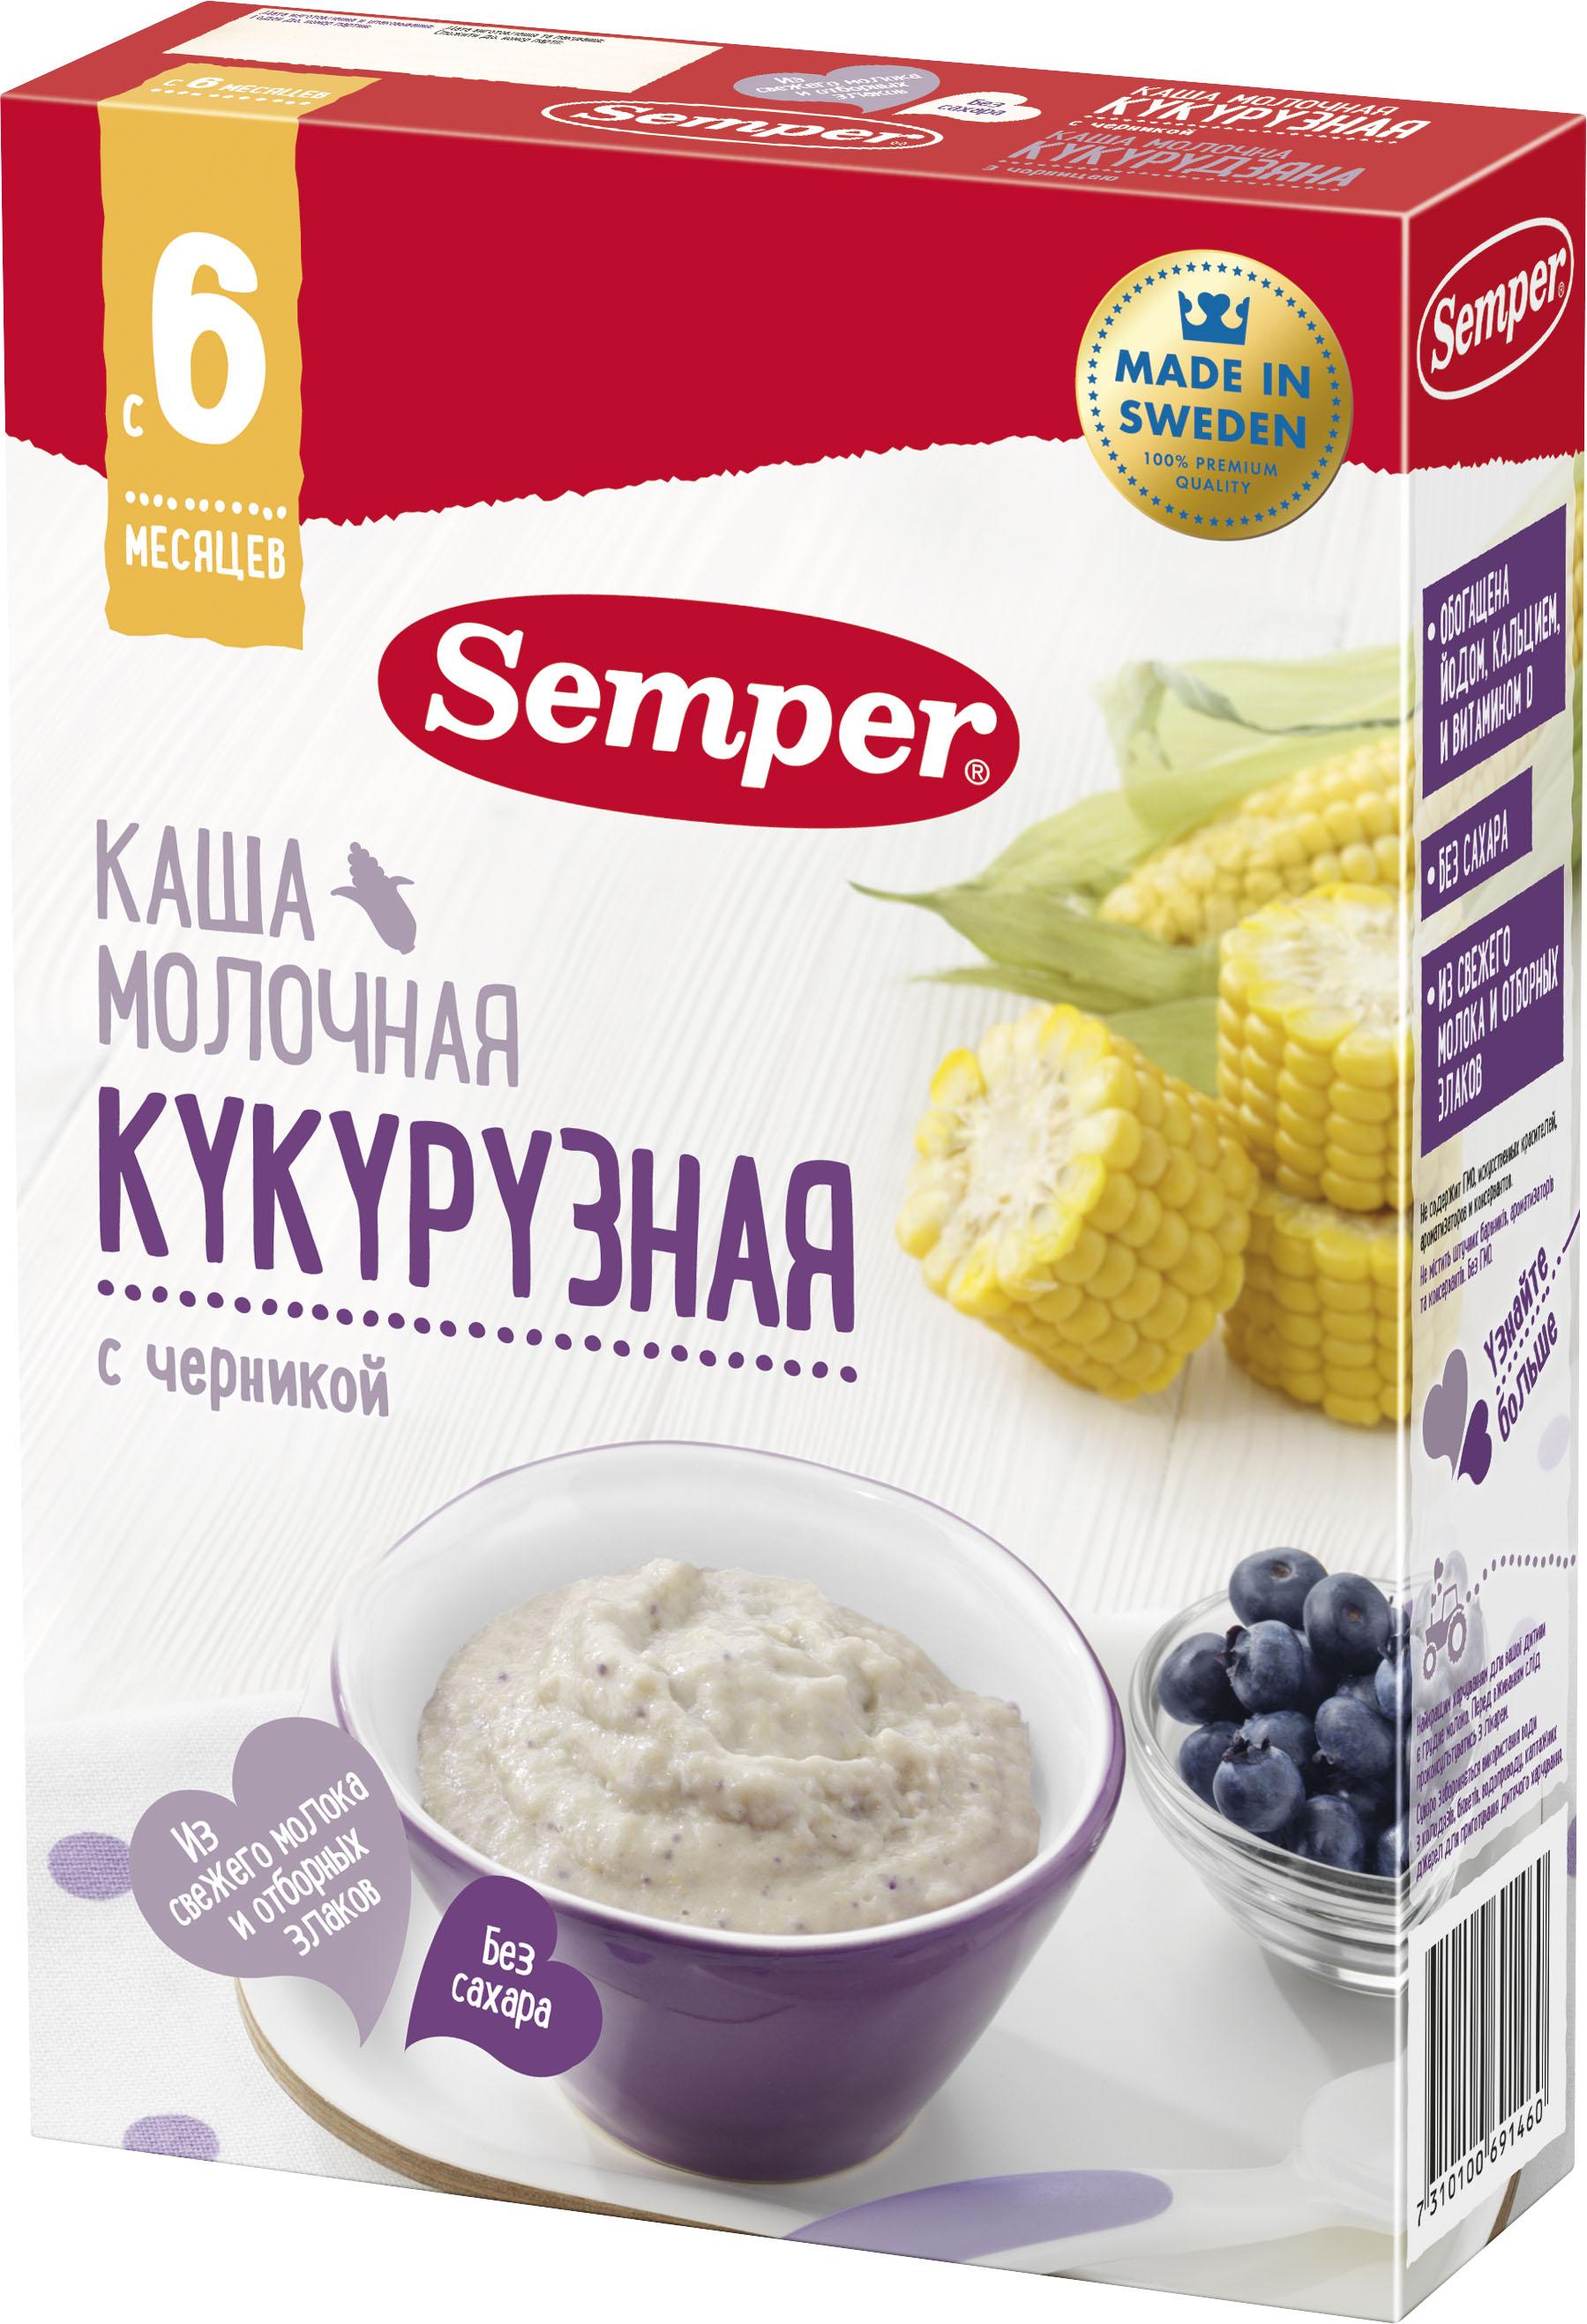 Молочные Semper Semper Молочная кукурузная с черникой (с 6 месяцев) 200 г беллакт каша молочная кукурузная 200 г